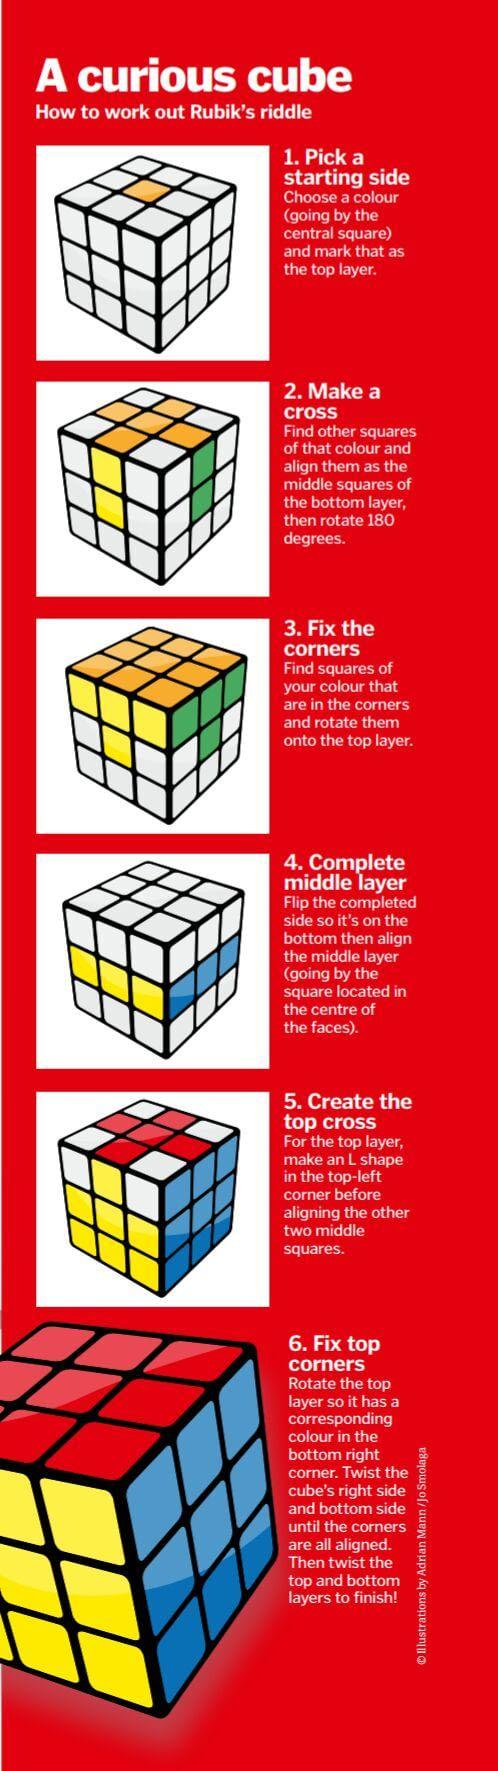 How To Solve A Rubik S Cube 9gag Diy Life Hacks Useful Life Hacks Simple Life Hacks